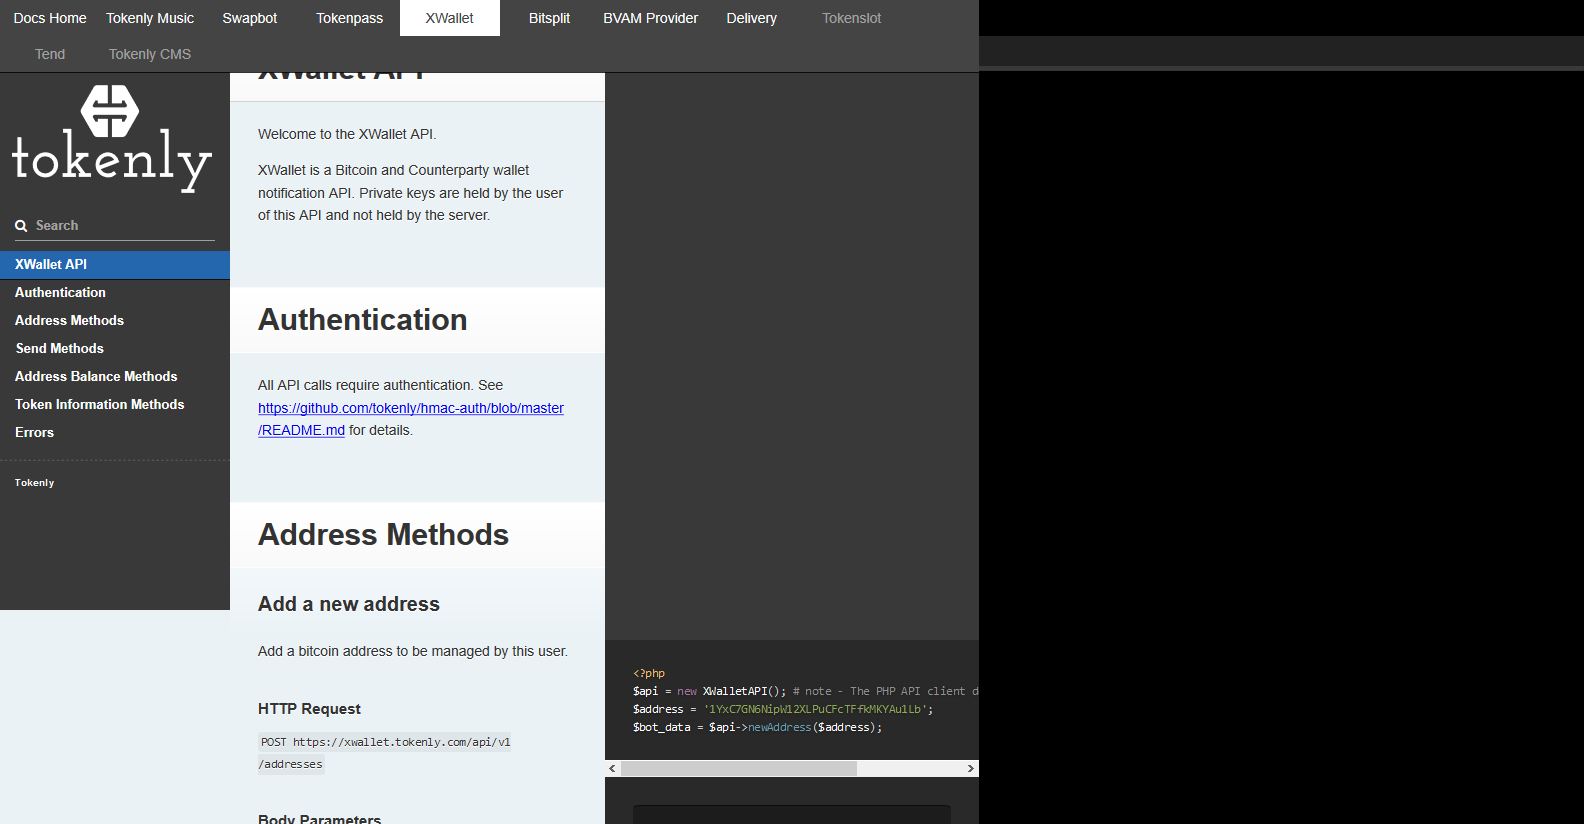 Tokenly XWallet API